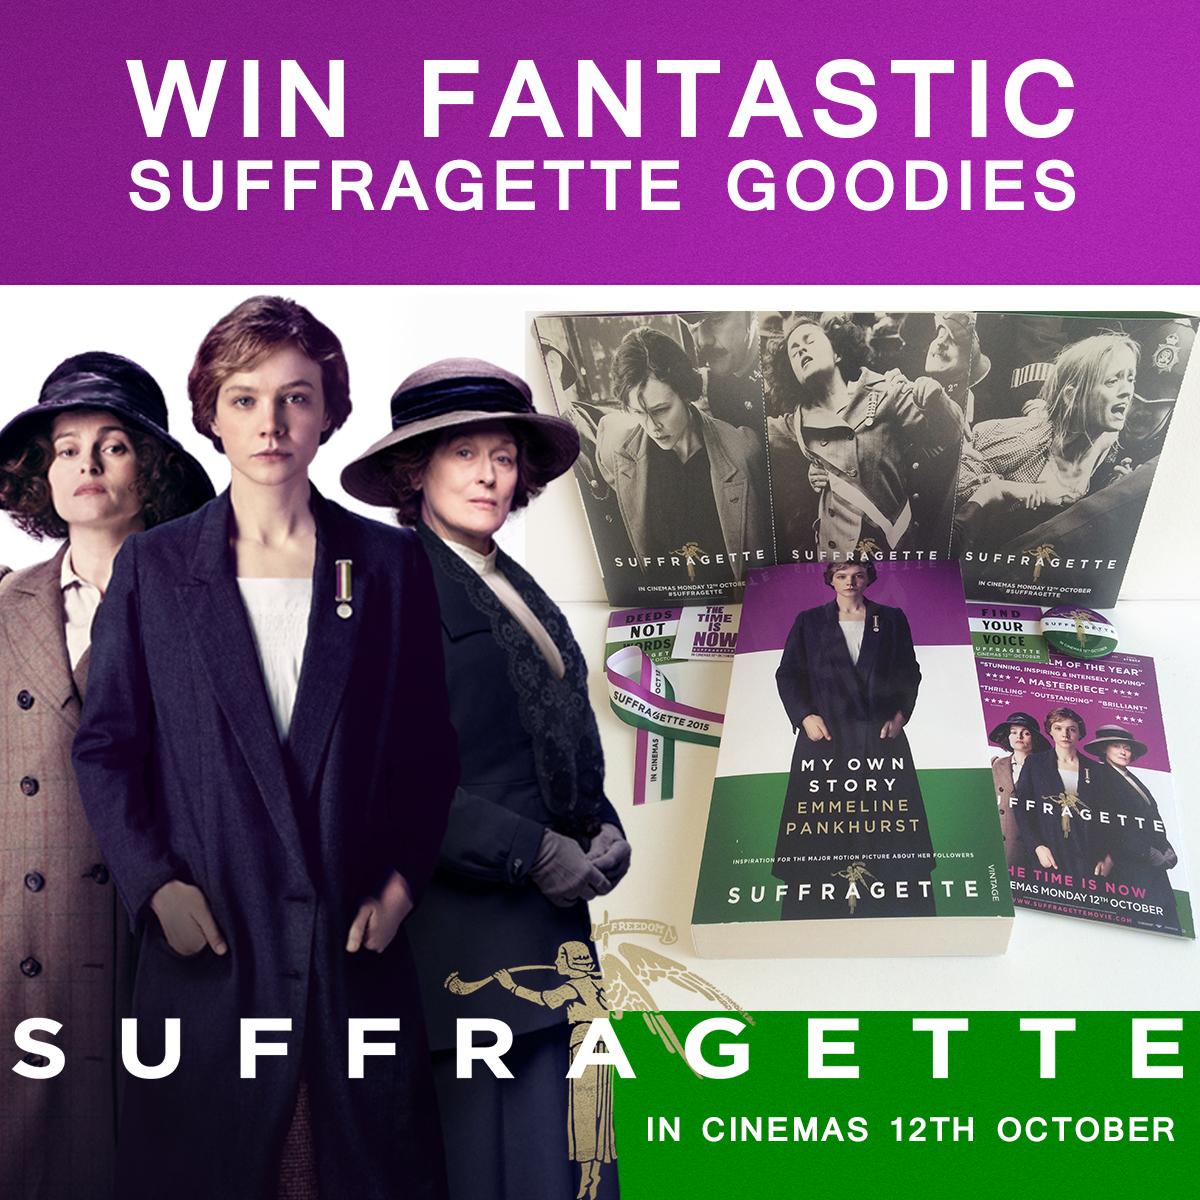 Suffragette competition